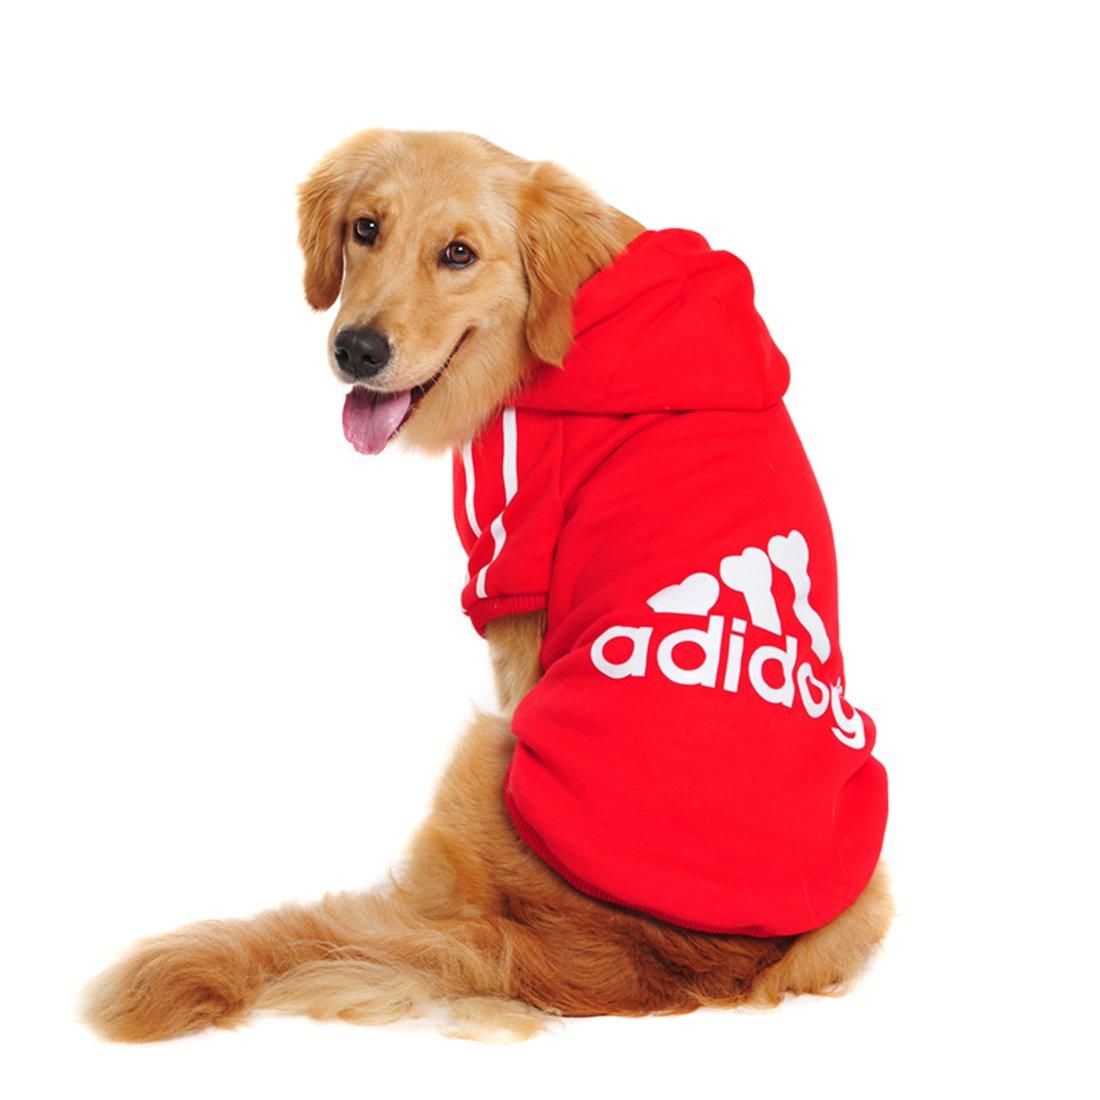 High Quality Spring Autumn Big Dog Clothes Coat Jacket Clothing for Dogs Large Size Golden Retriever Labrador 3XL-9XL Adidog Hoodie (Black, 6XL) Idepet